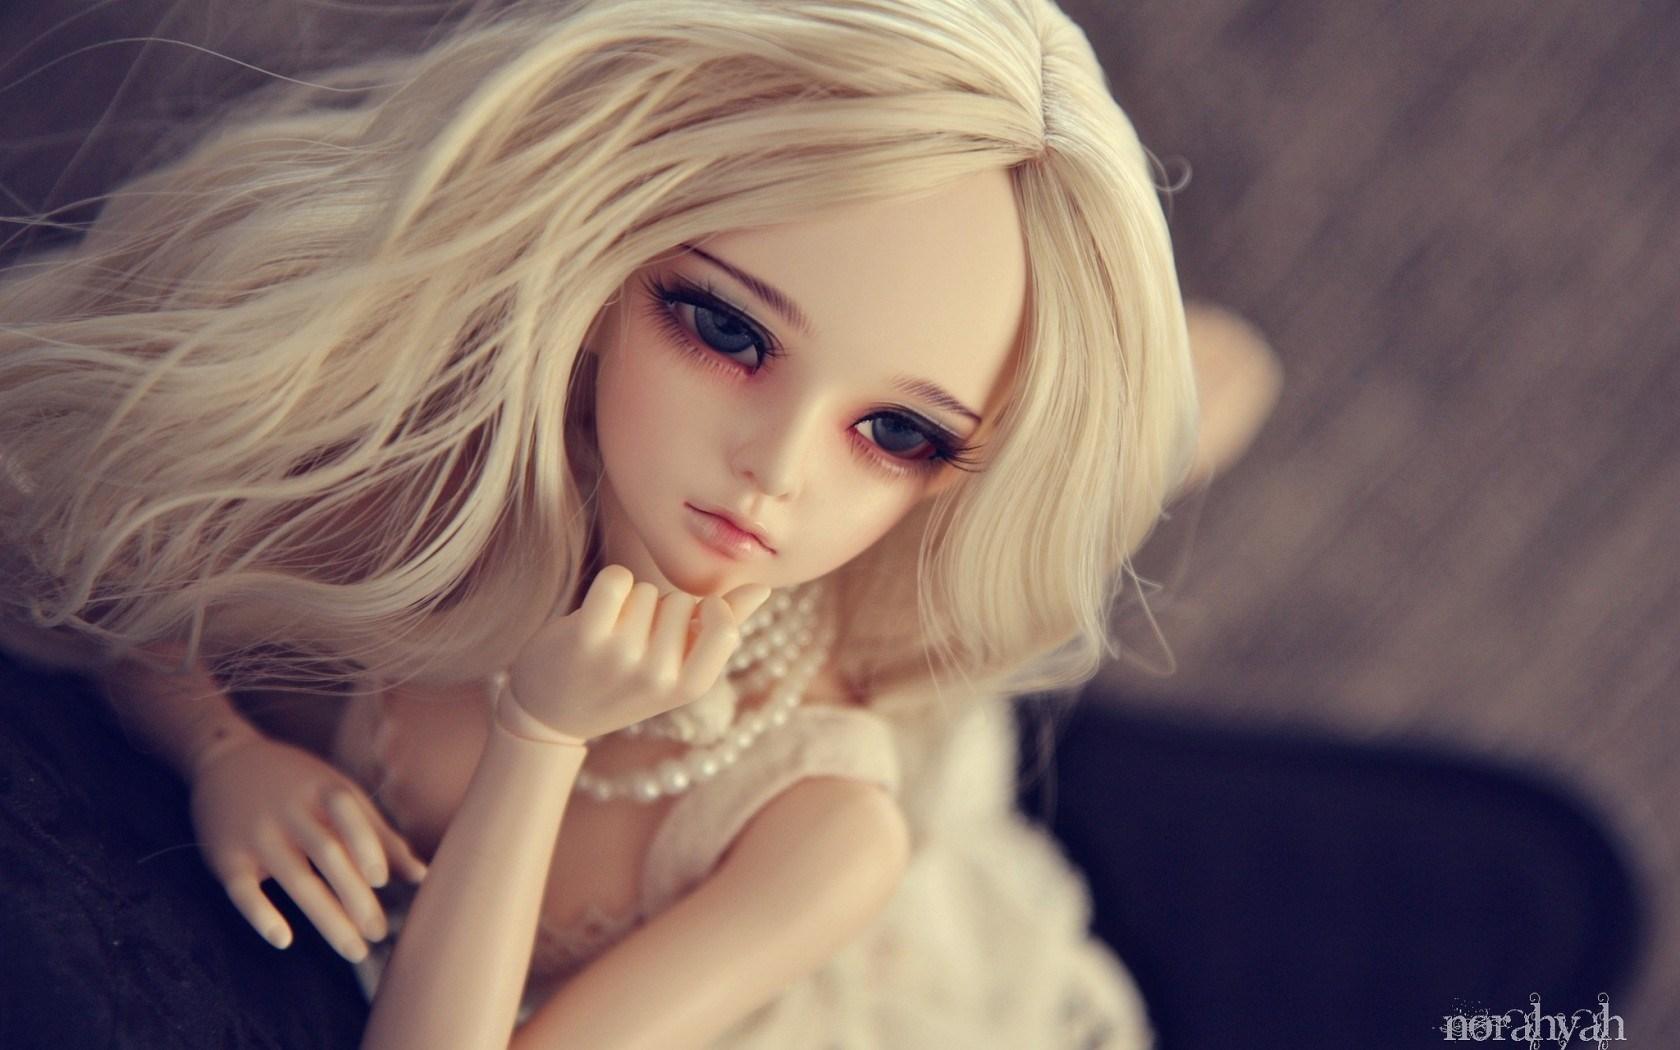 Beautiful Blonde Doll   Wallpaper High Definition High Quality 1680x1050